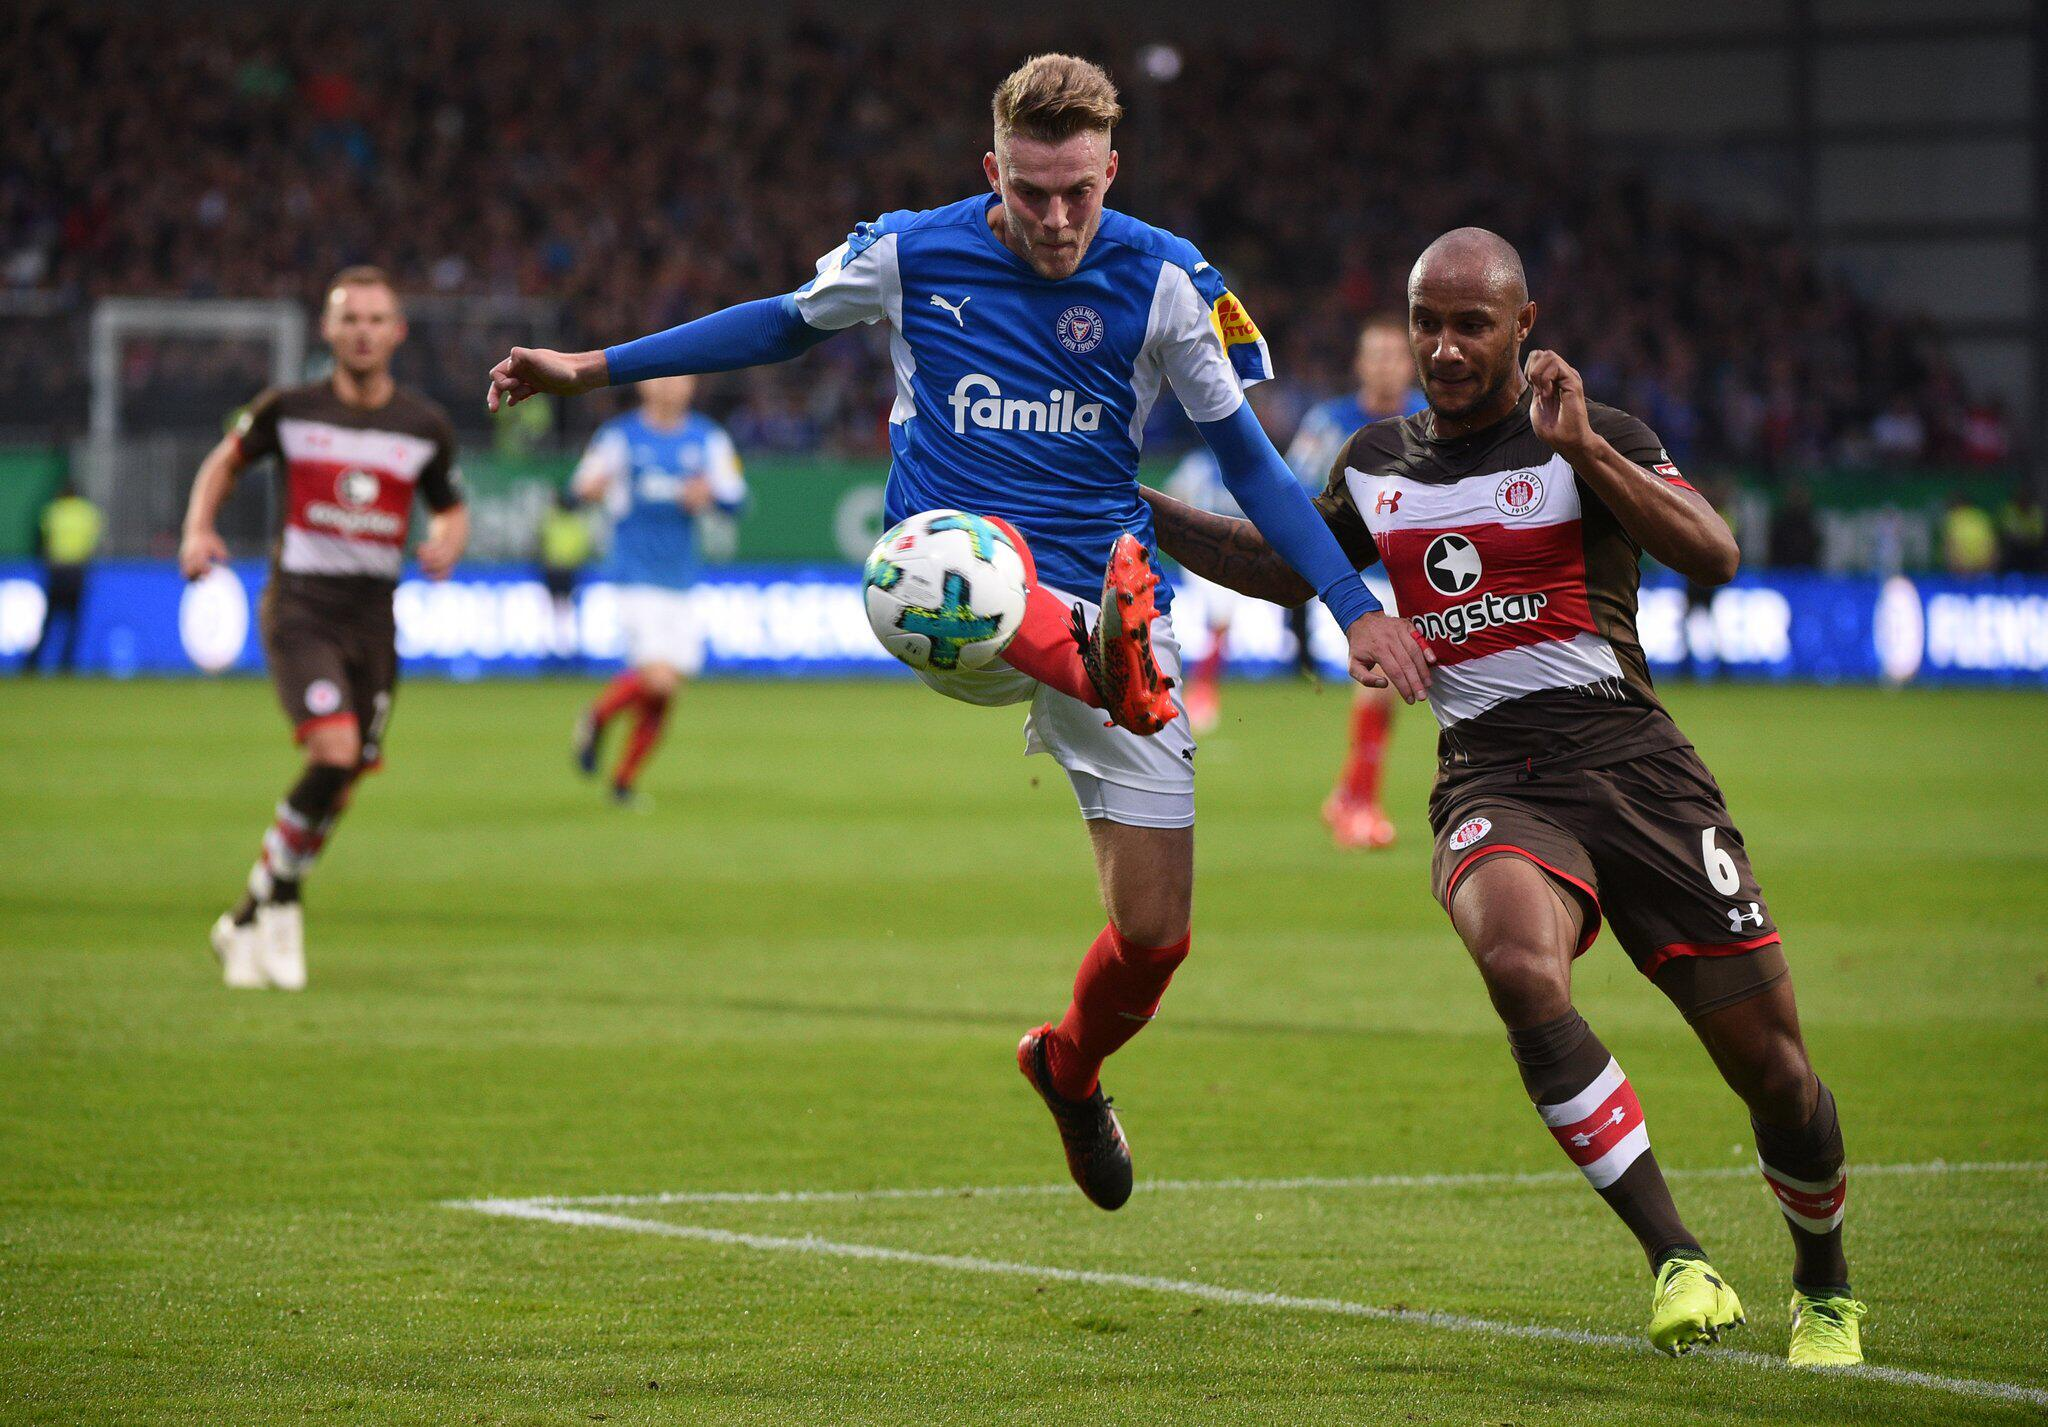 Holstein Kiel 2 Liga